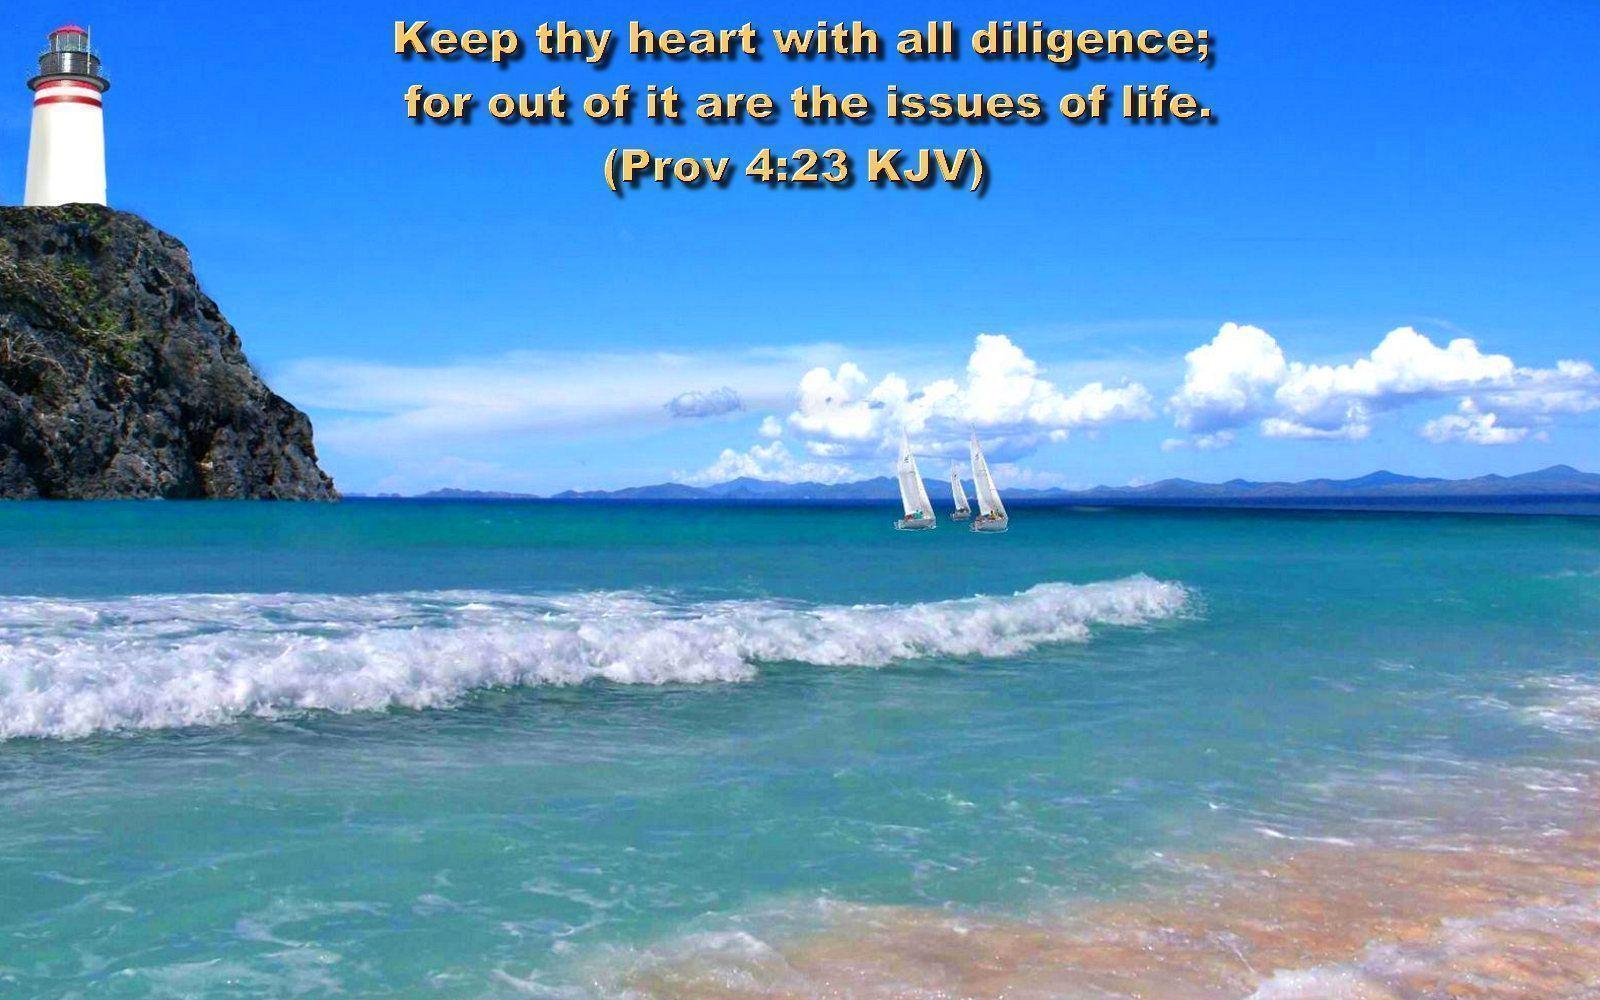 Free Desktop Wallpaper Scripture Fall Inspiring Inspirational Bible Verses Wallpapers Wallpaper Cave